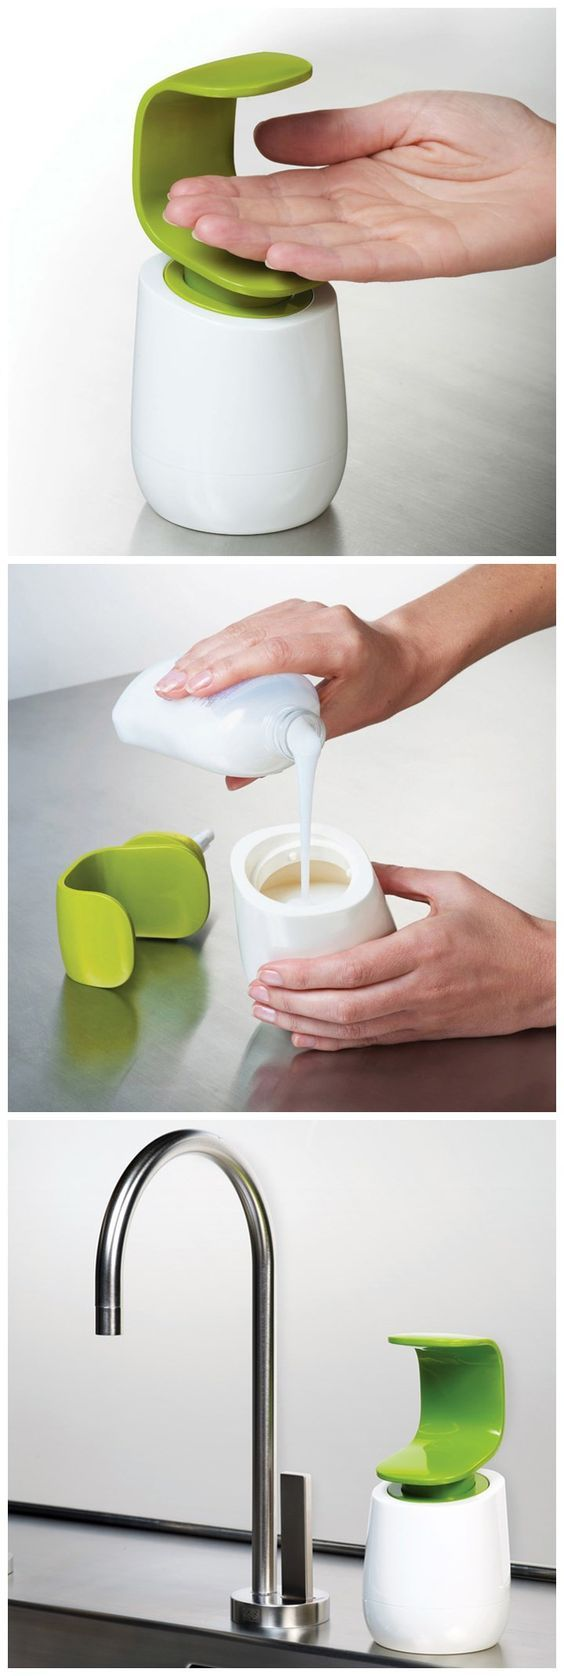 25 Best Ideas About Soap Dispenser On Pinterest Kitchen